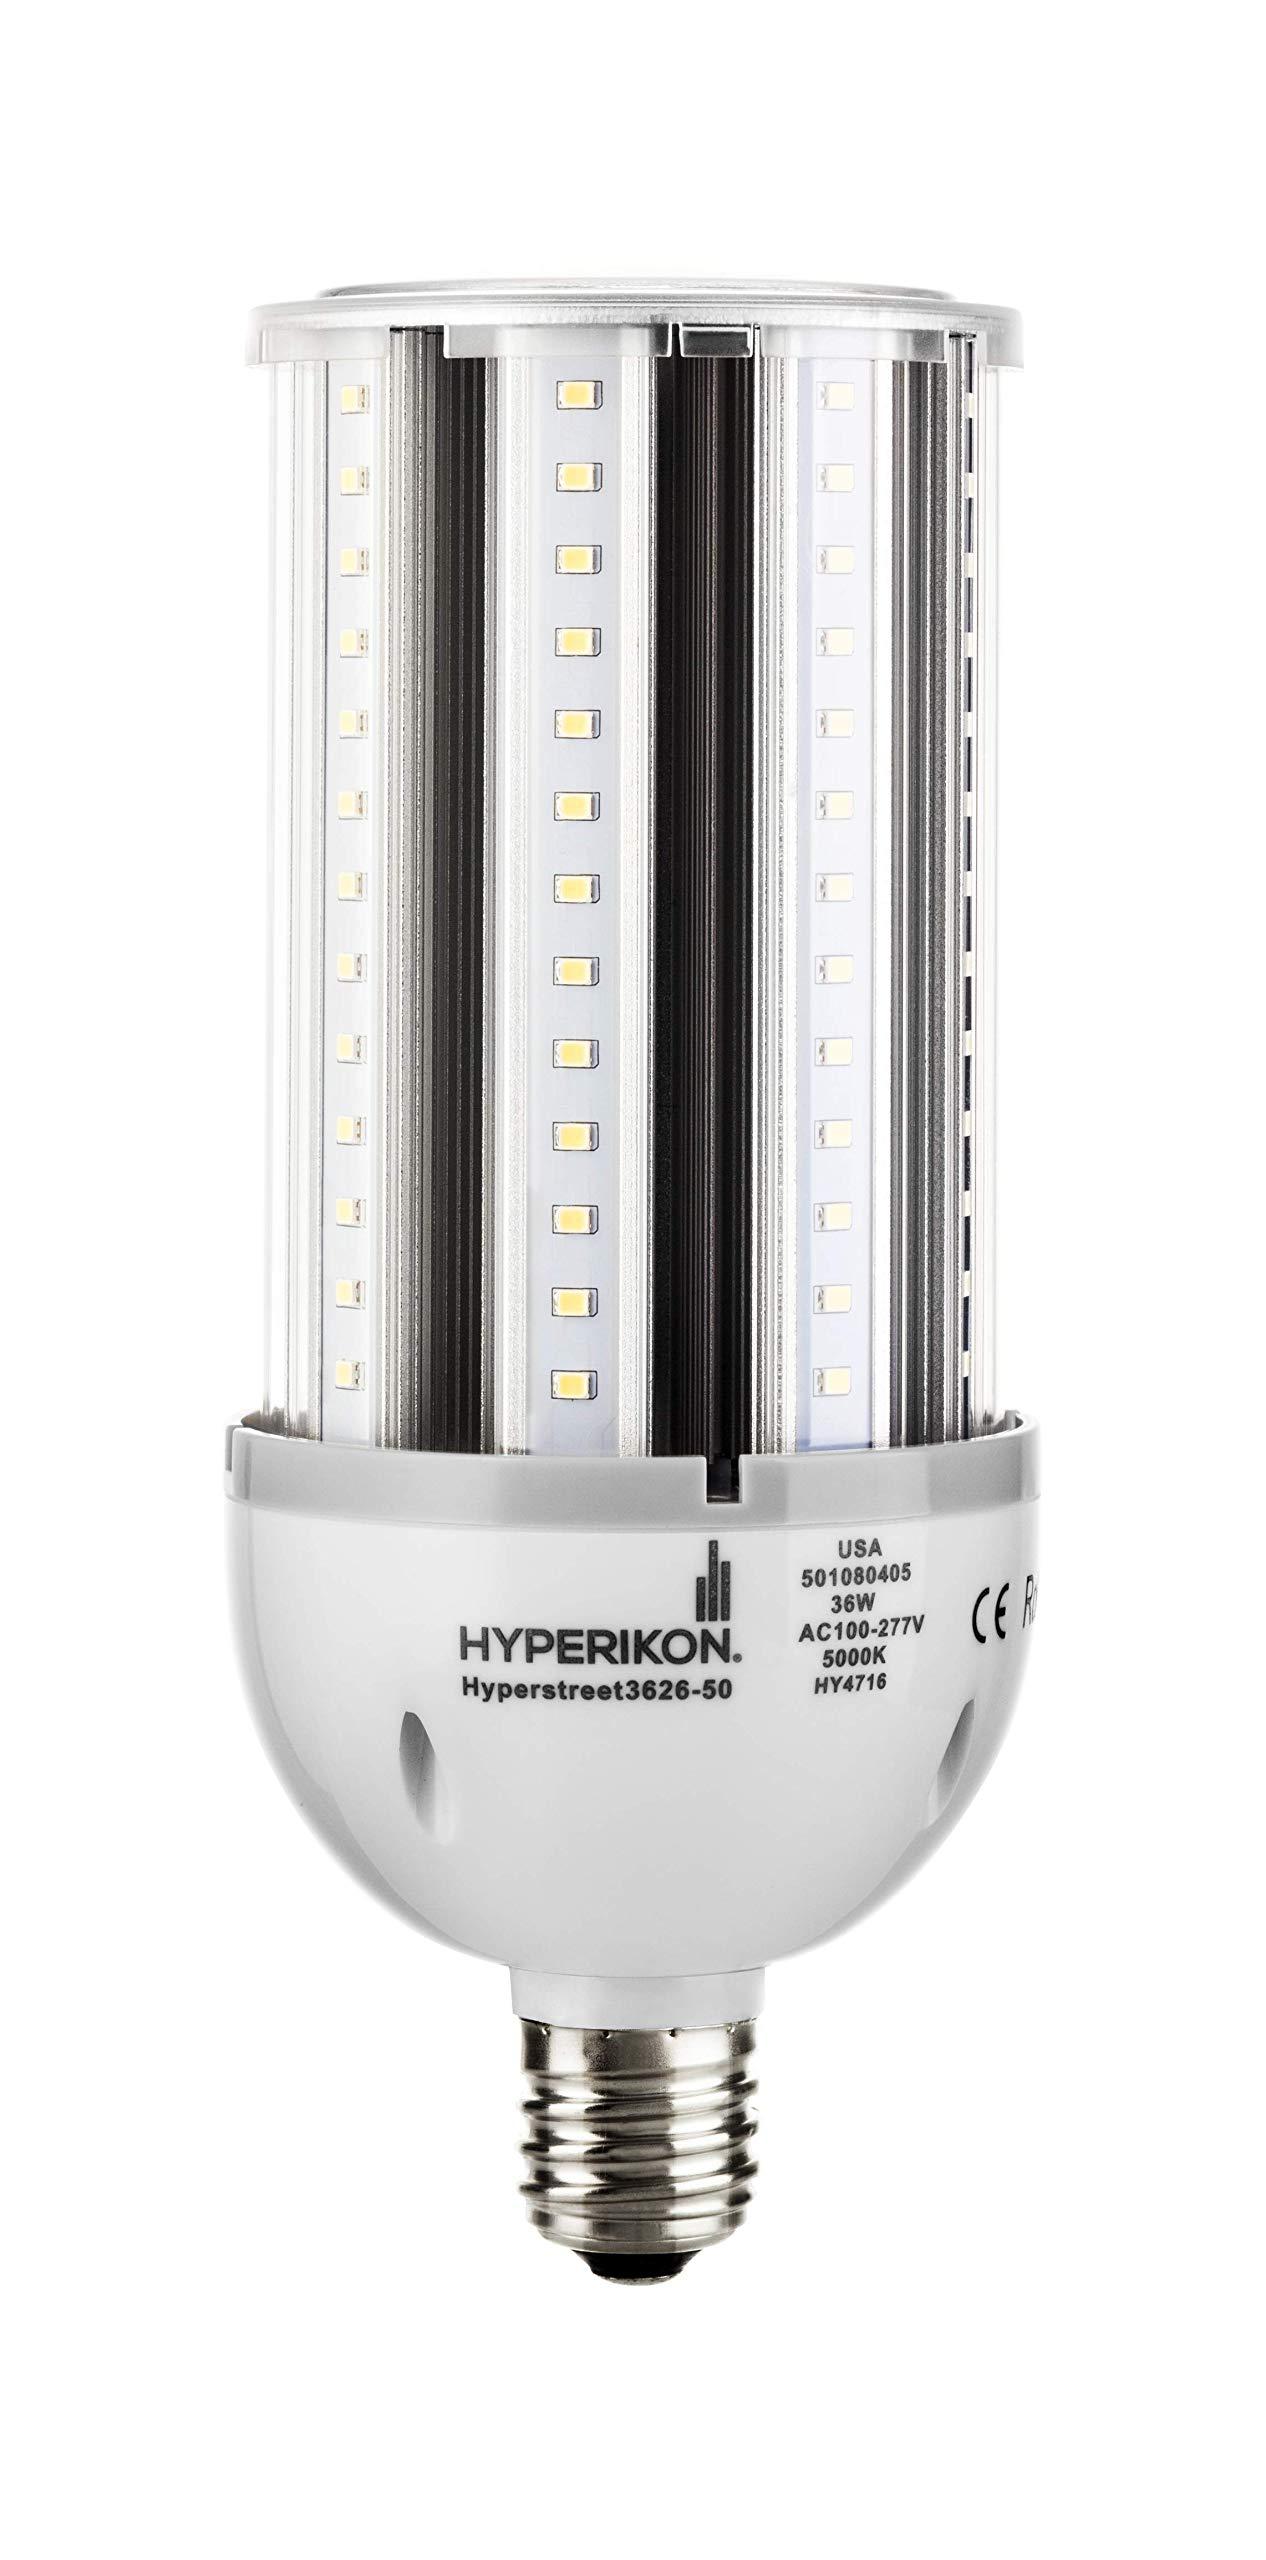 Hyperikon LED Street Light, 36W (200W Equivalent), E39 (Large Mogul Base), 4340 lumen, 5000K (Crystal White Glow), 320° Omnidirectional, 100-277v, CRI 85, UL-listed and DLC Certified